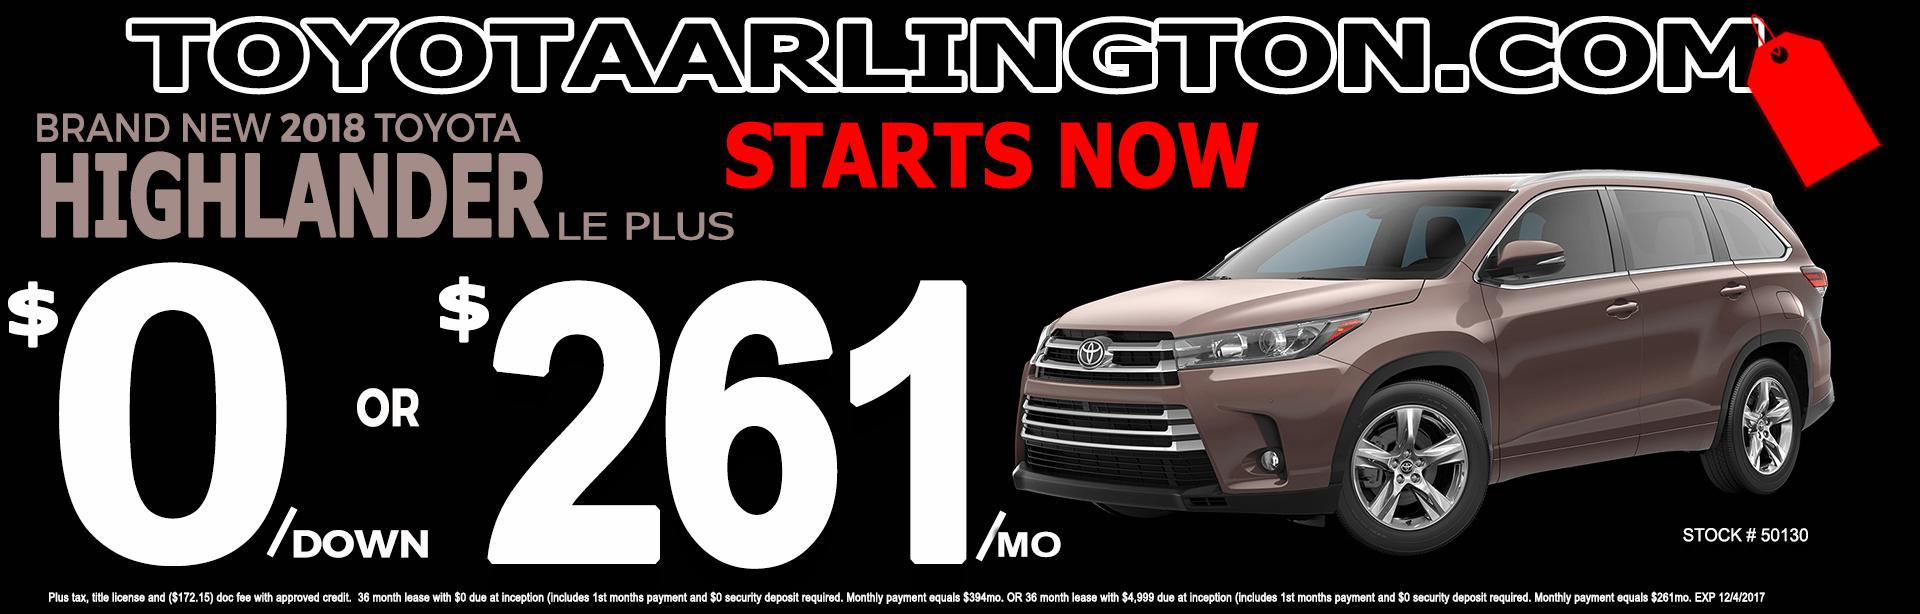 Arlington Toyota Il >> Arlington Toyota